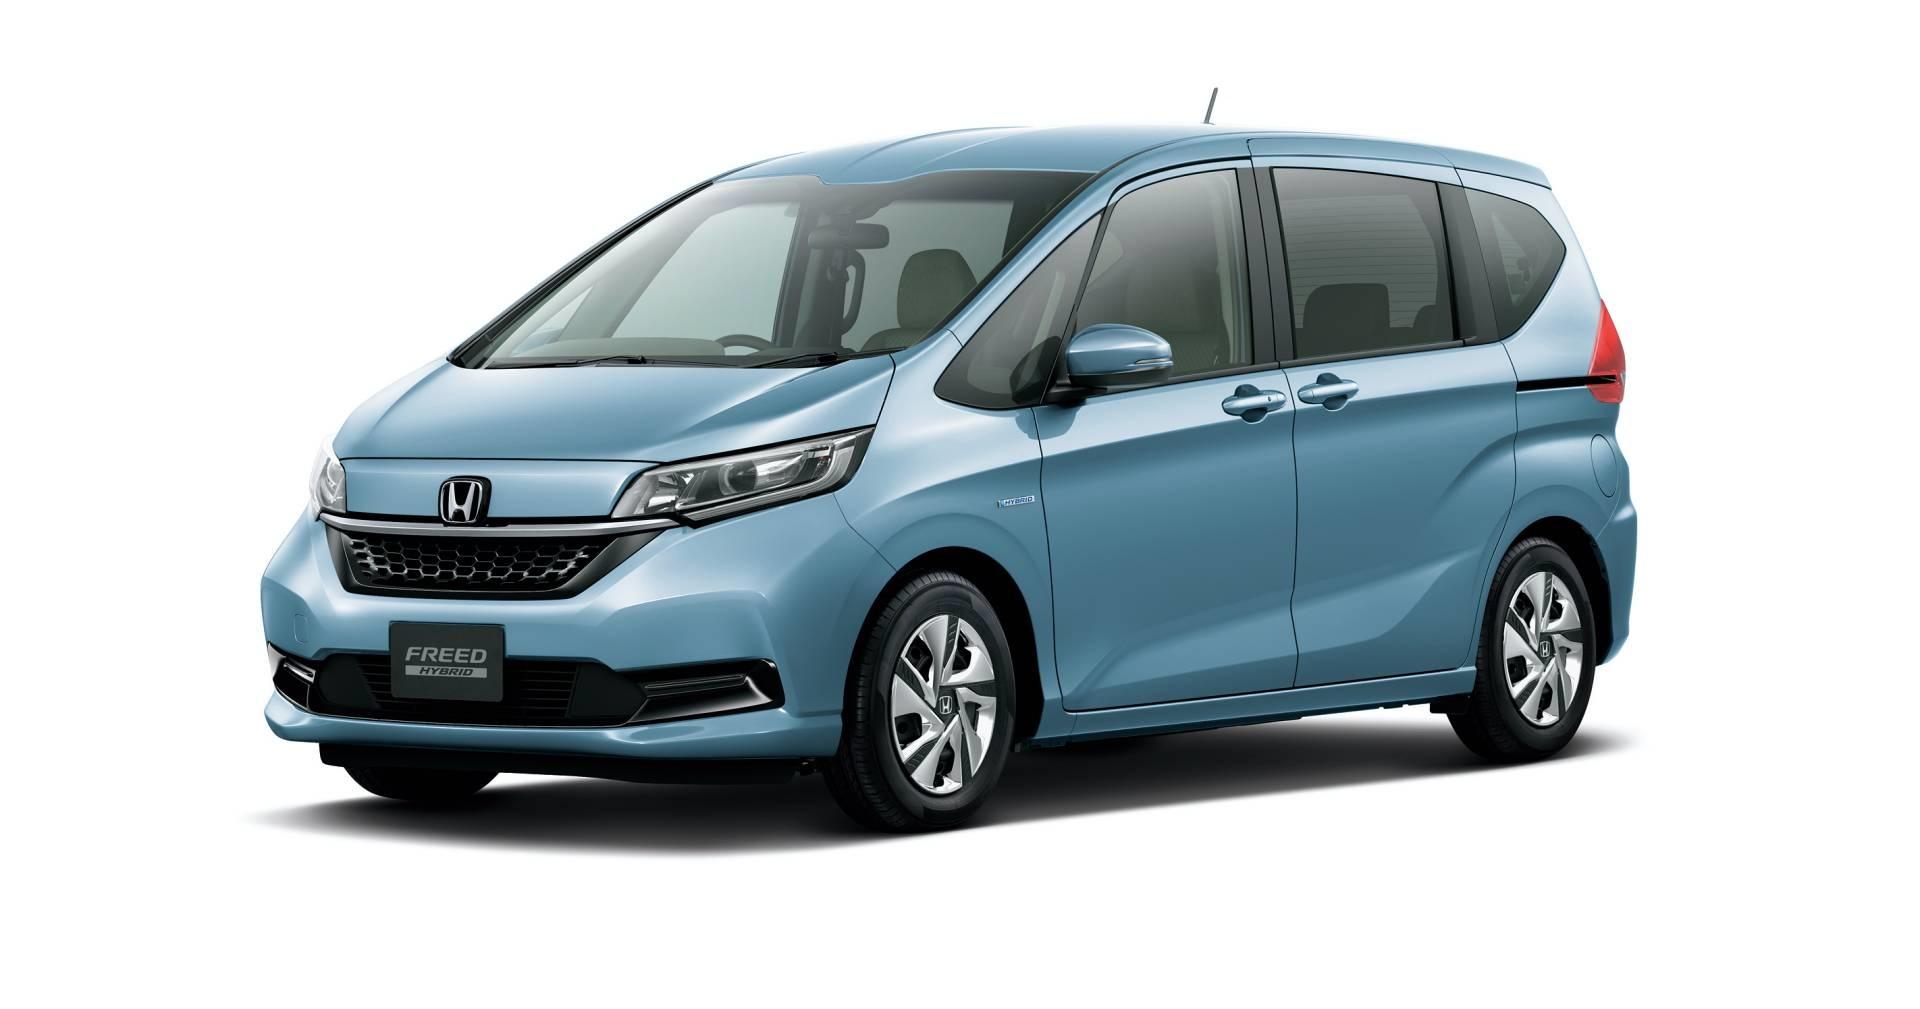 Honda-Freed-2020-39